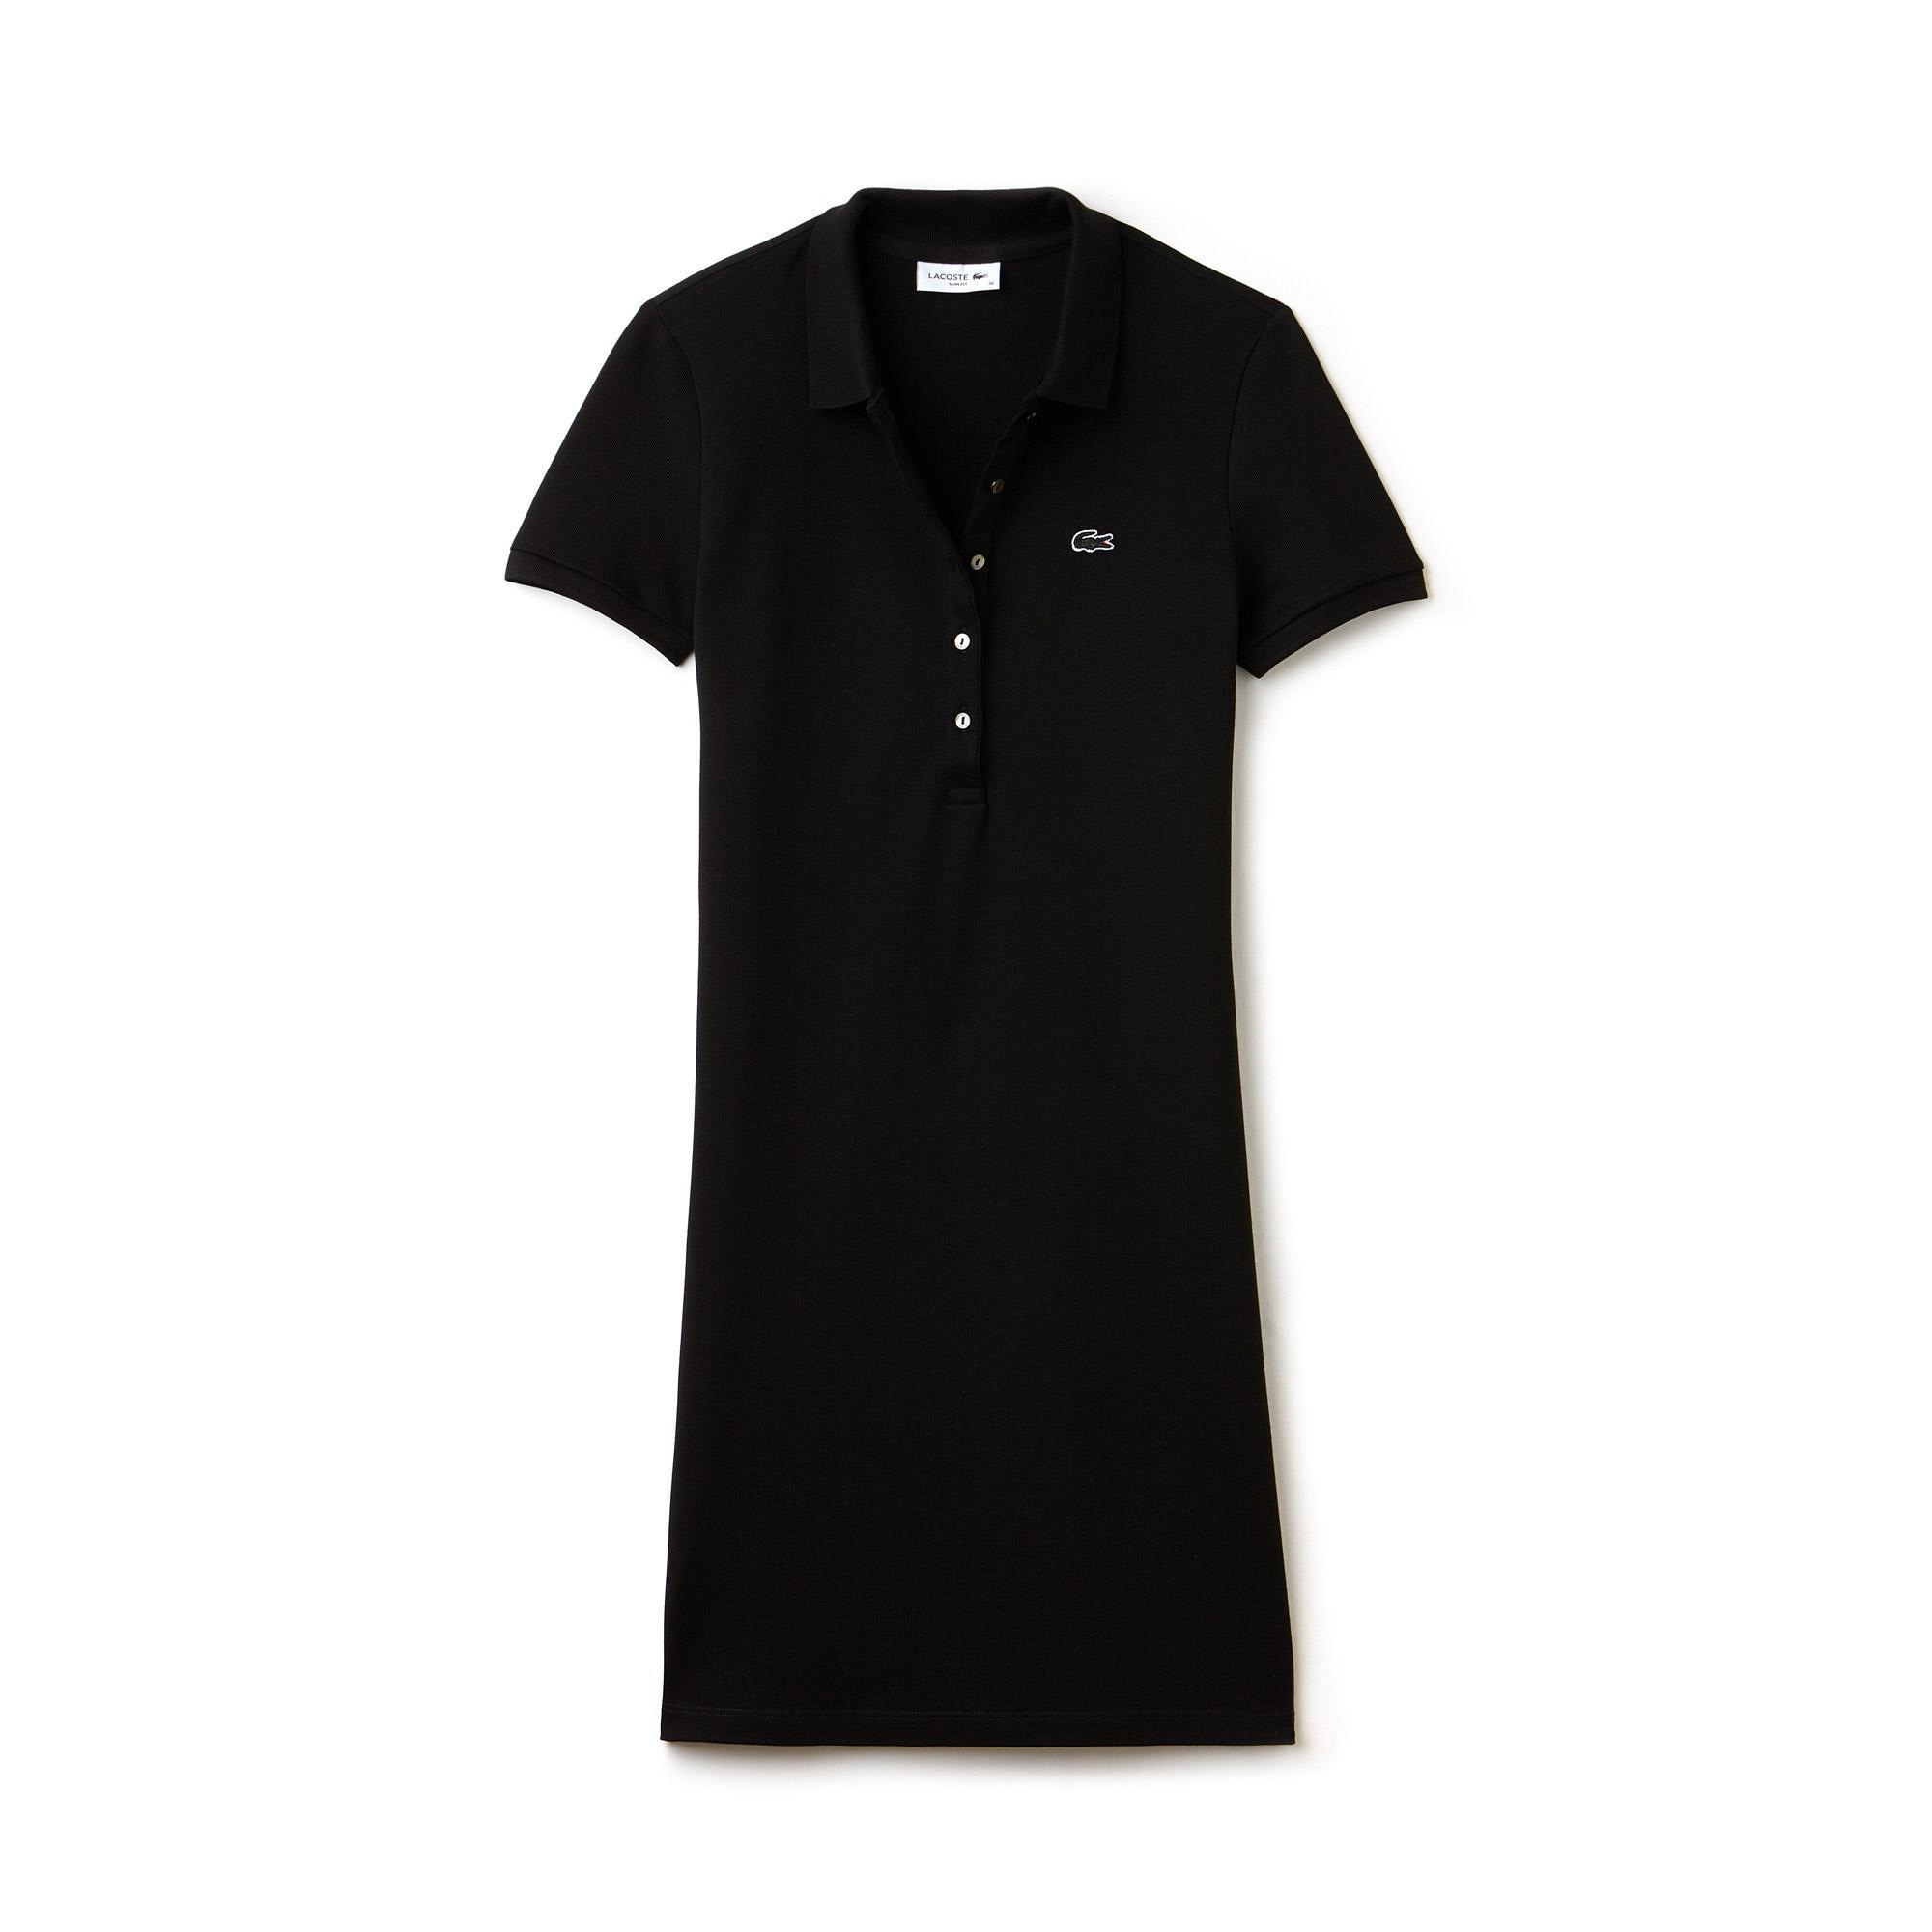 Lacoste Kadın Slim Fit Polo Yaka Siyah Elbise